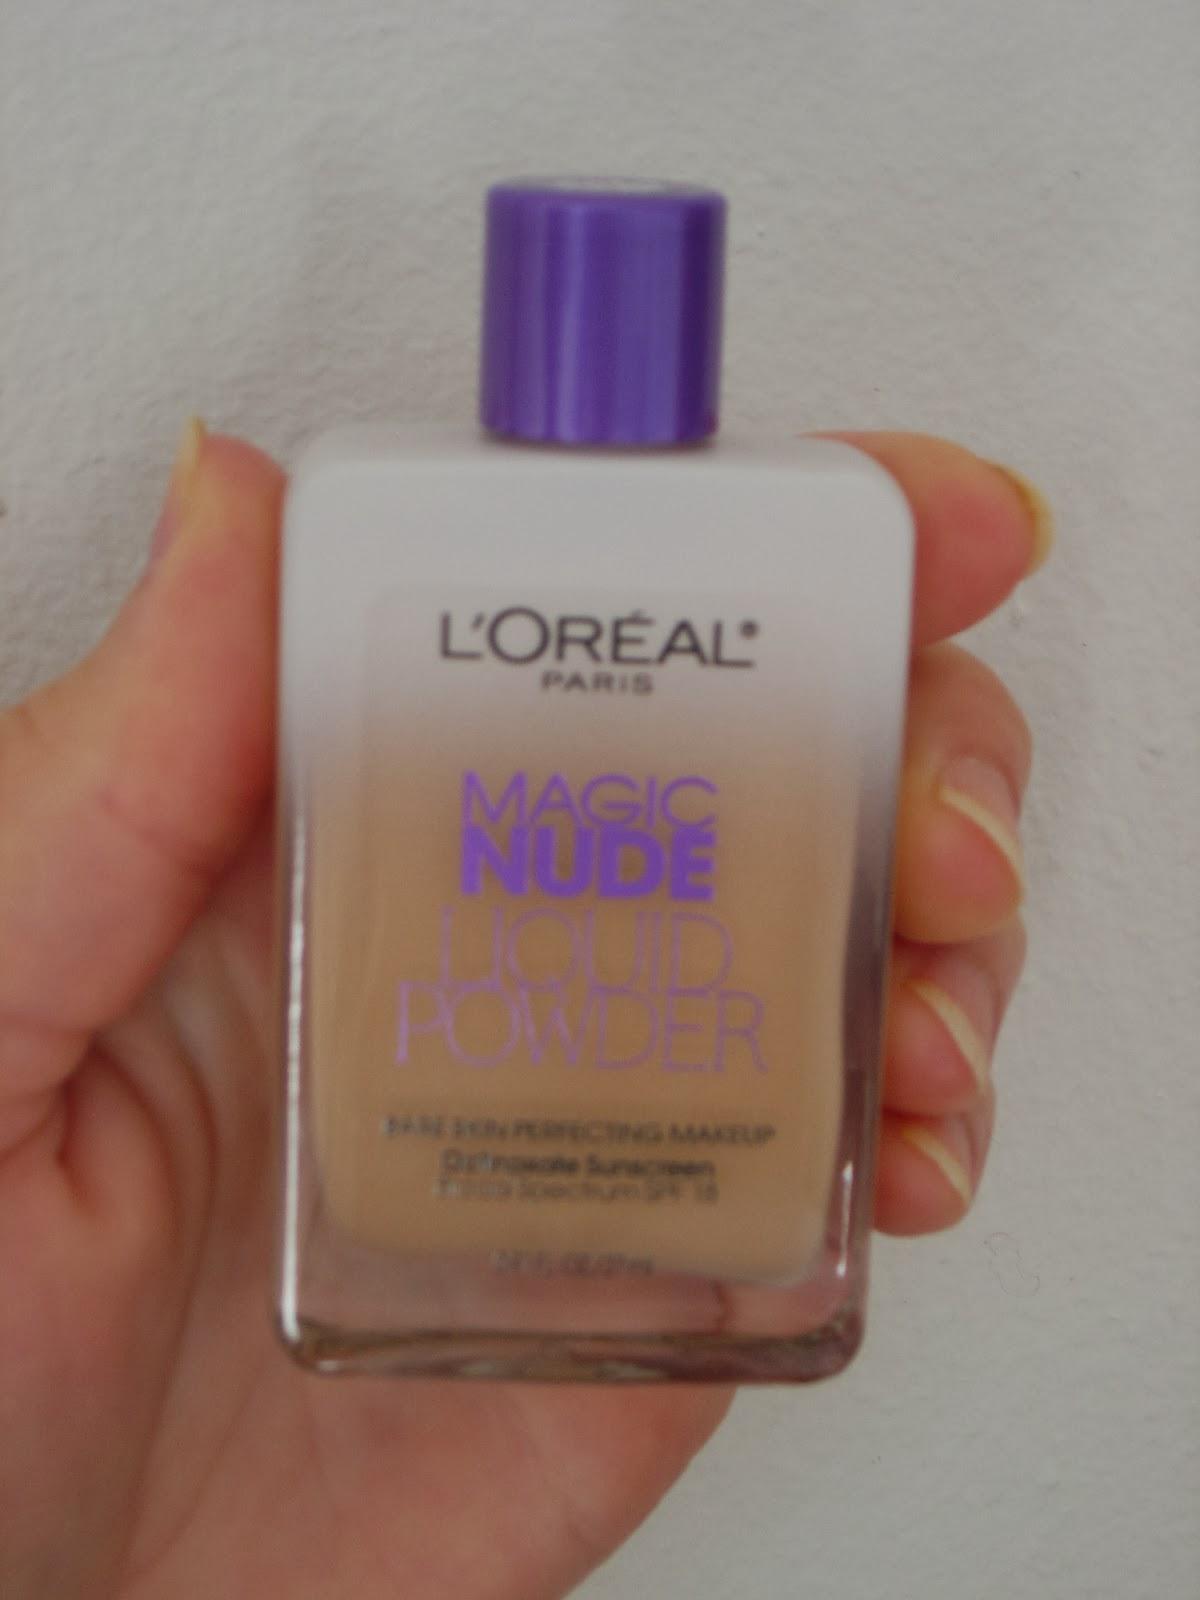 L'Oreal Paris Magic Nude Liquid Powder Bare Skin Perfecting Makeup.jpeg